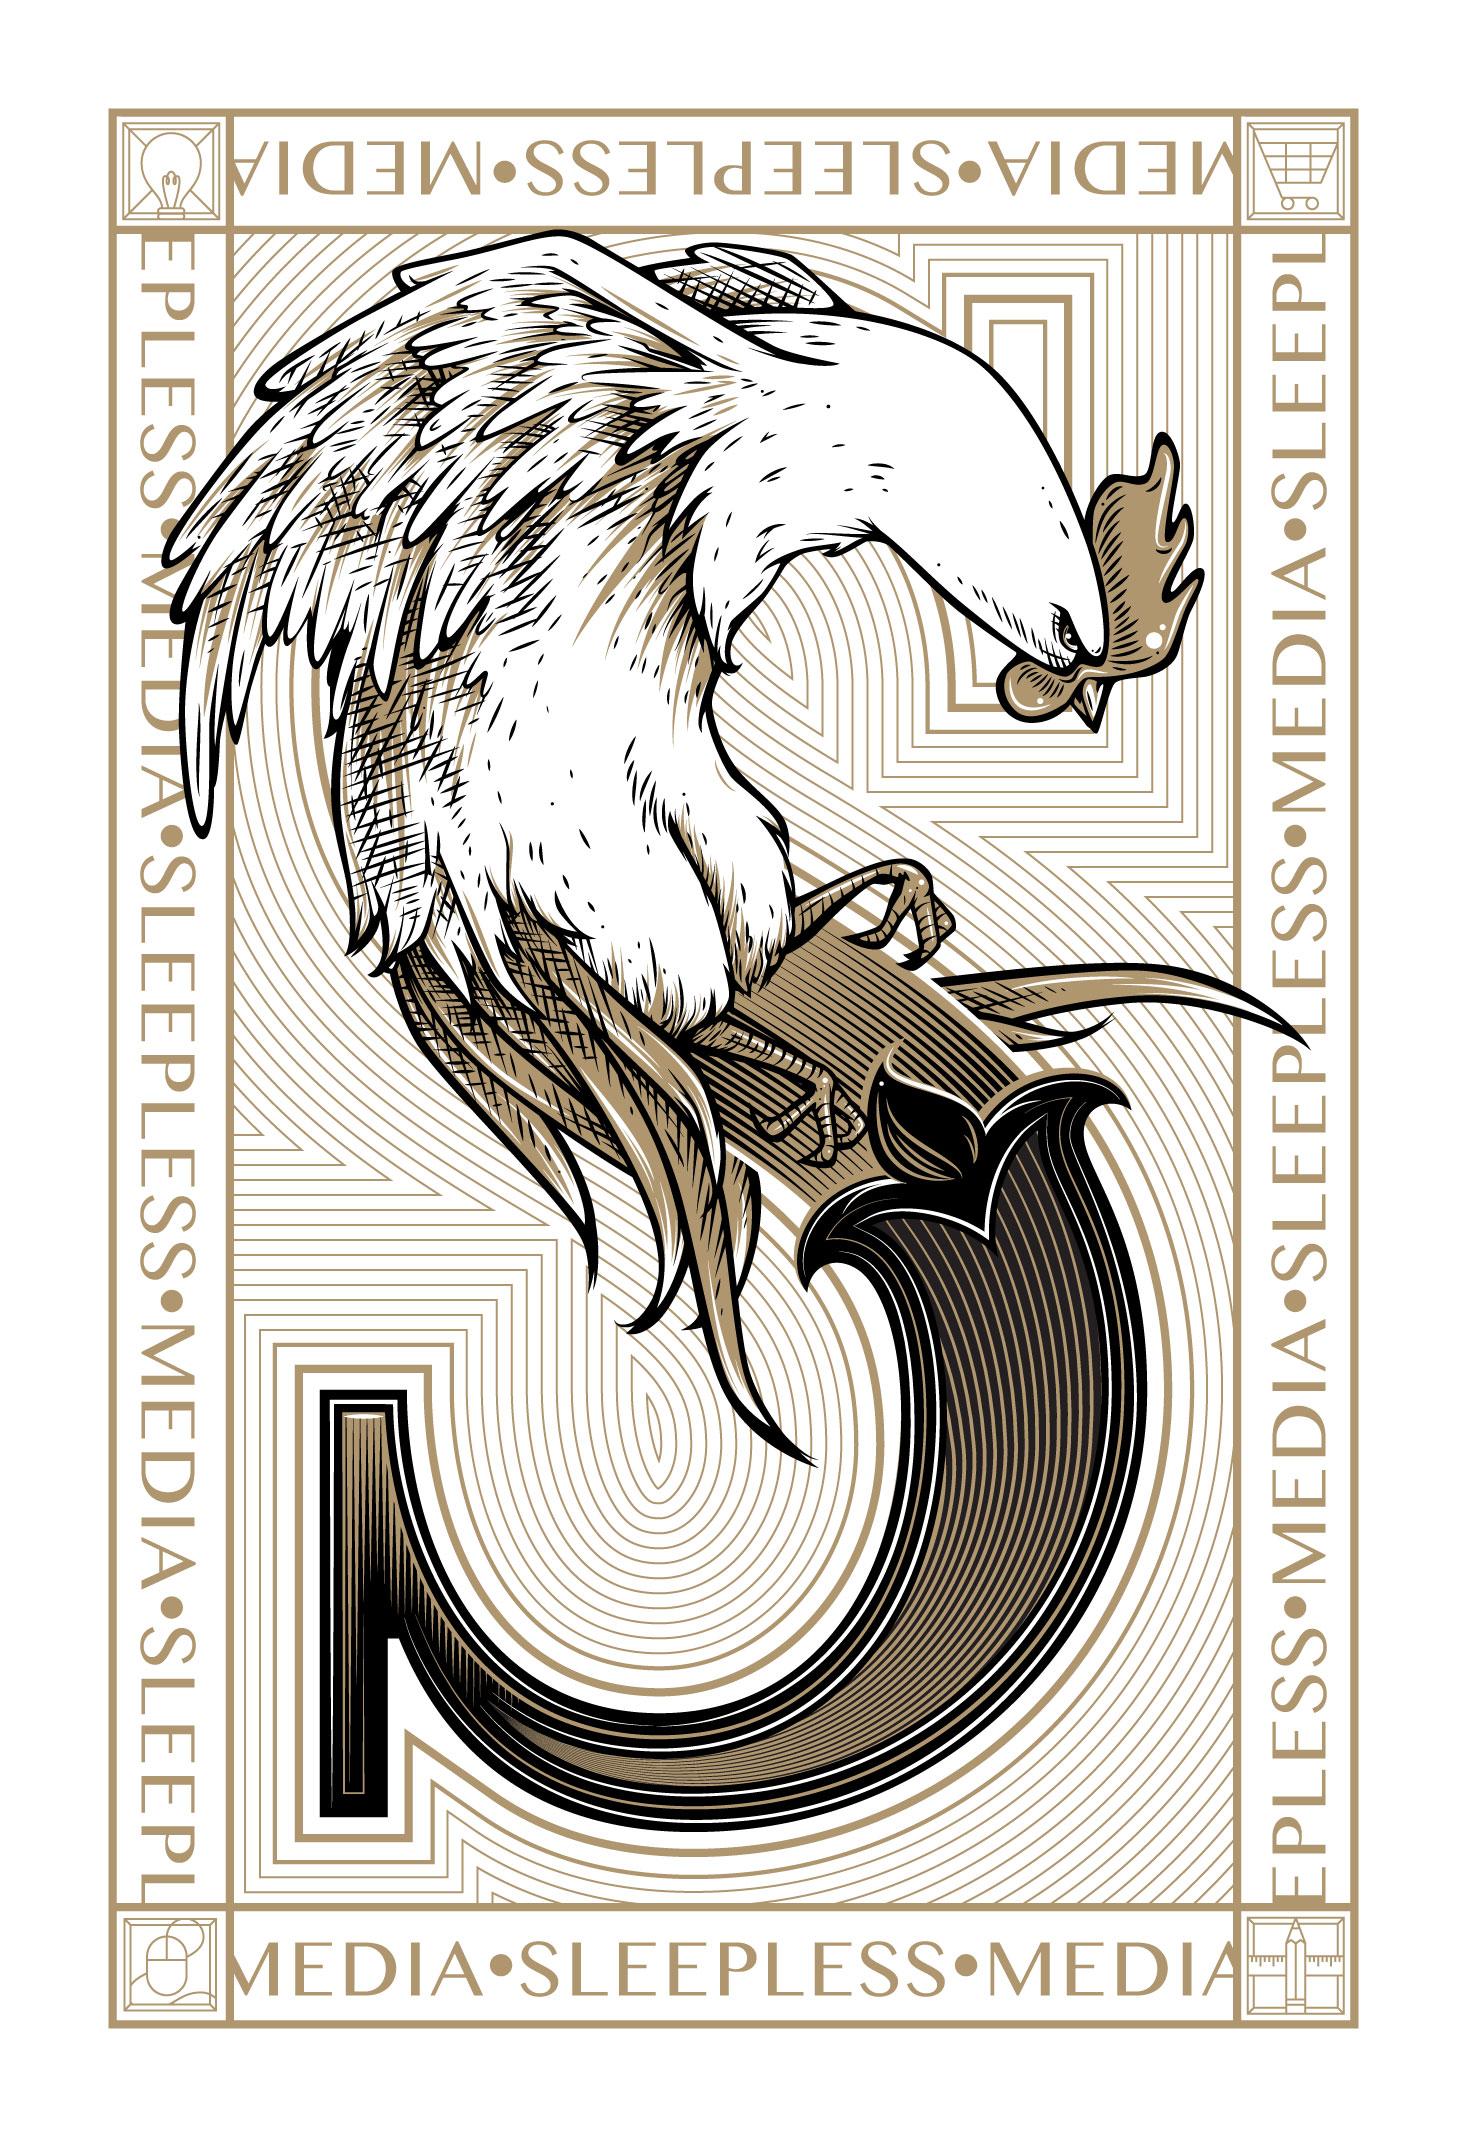 Sleepless Media - Ornate Rooster